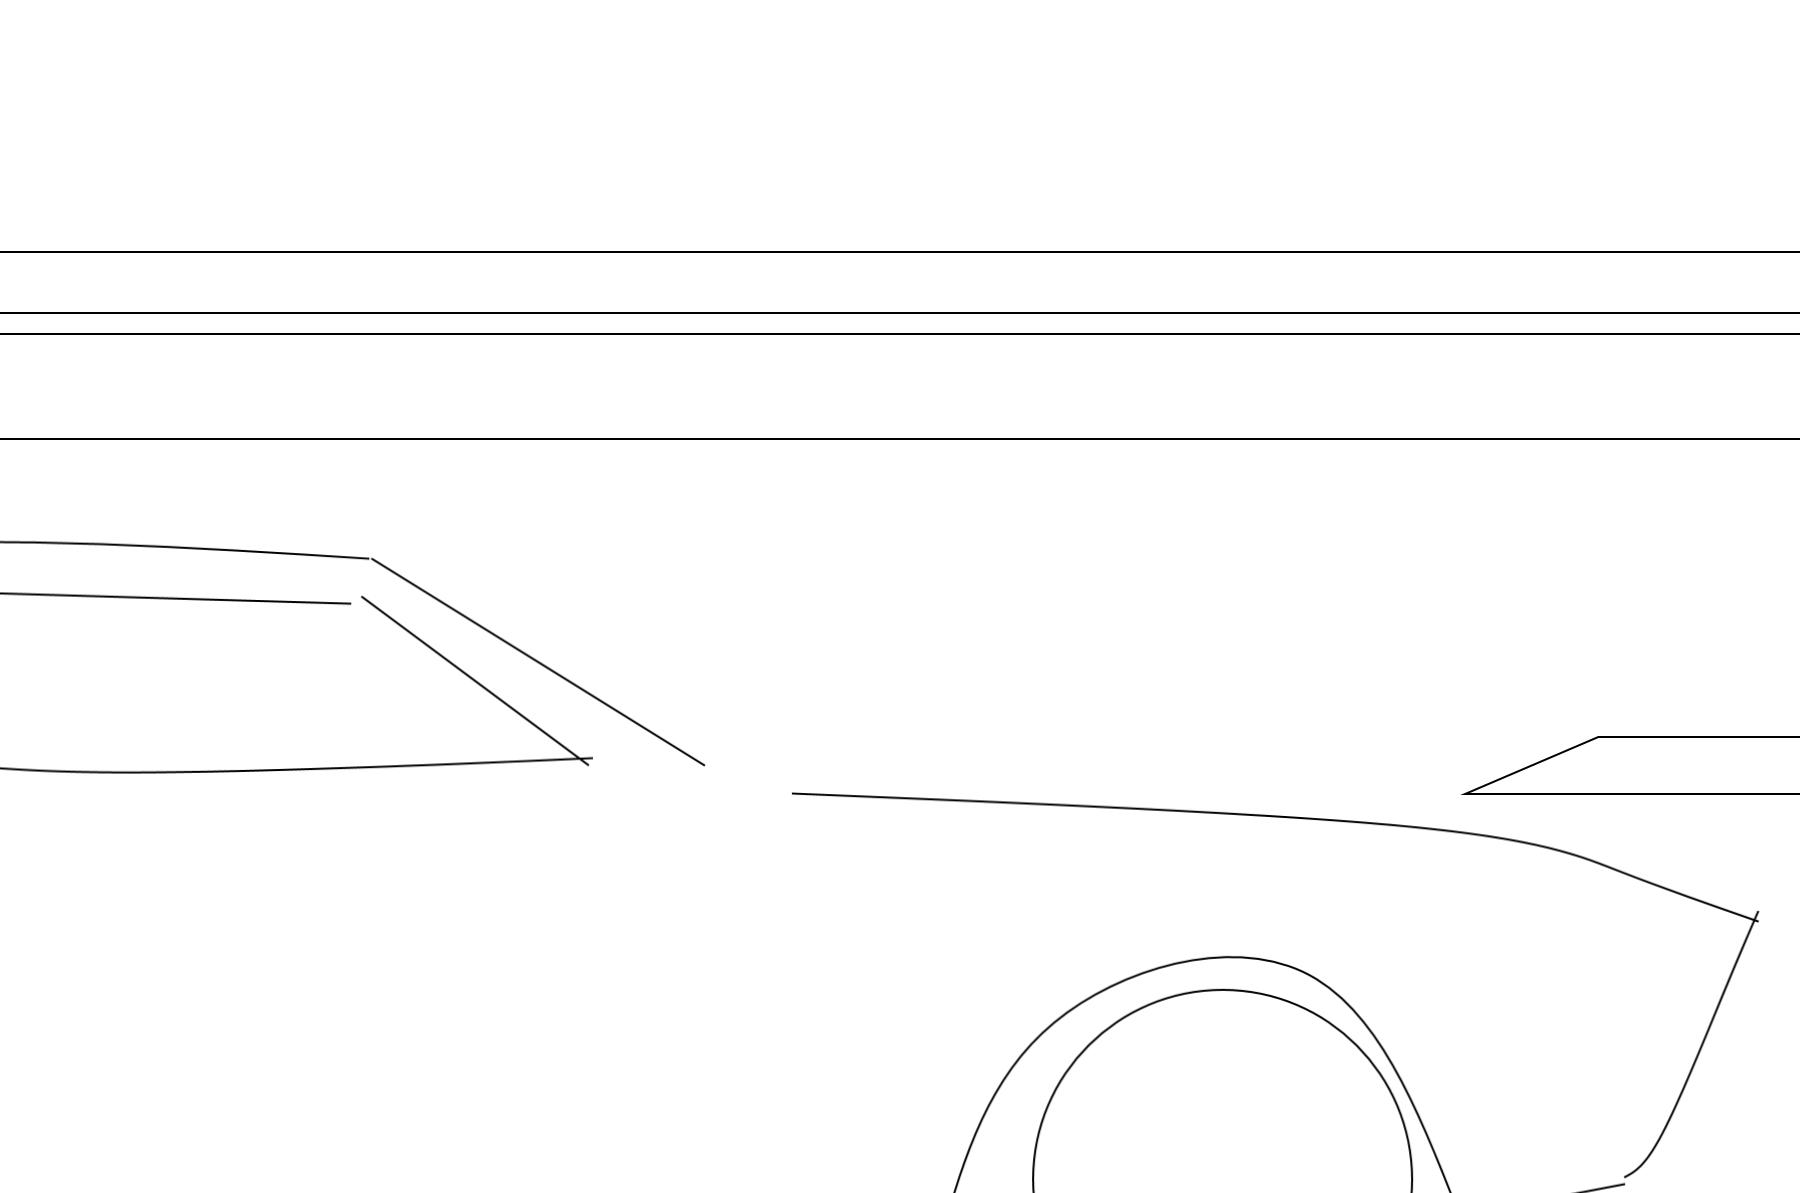 Car on Test Track